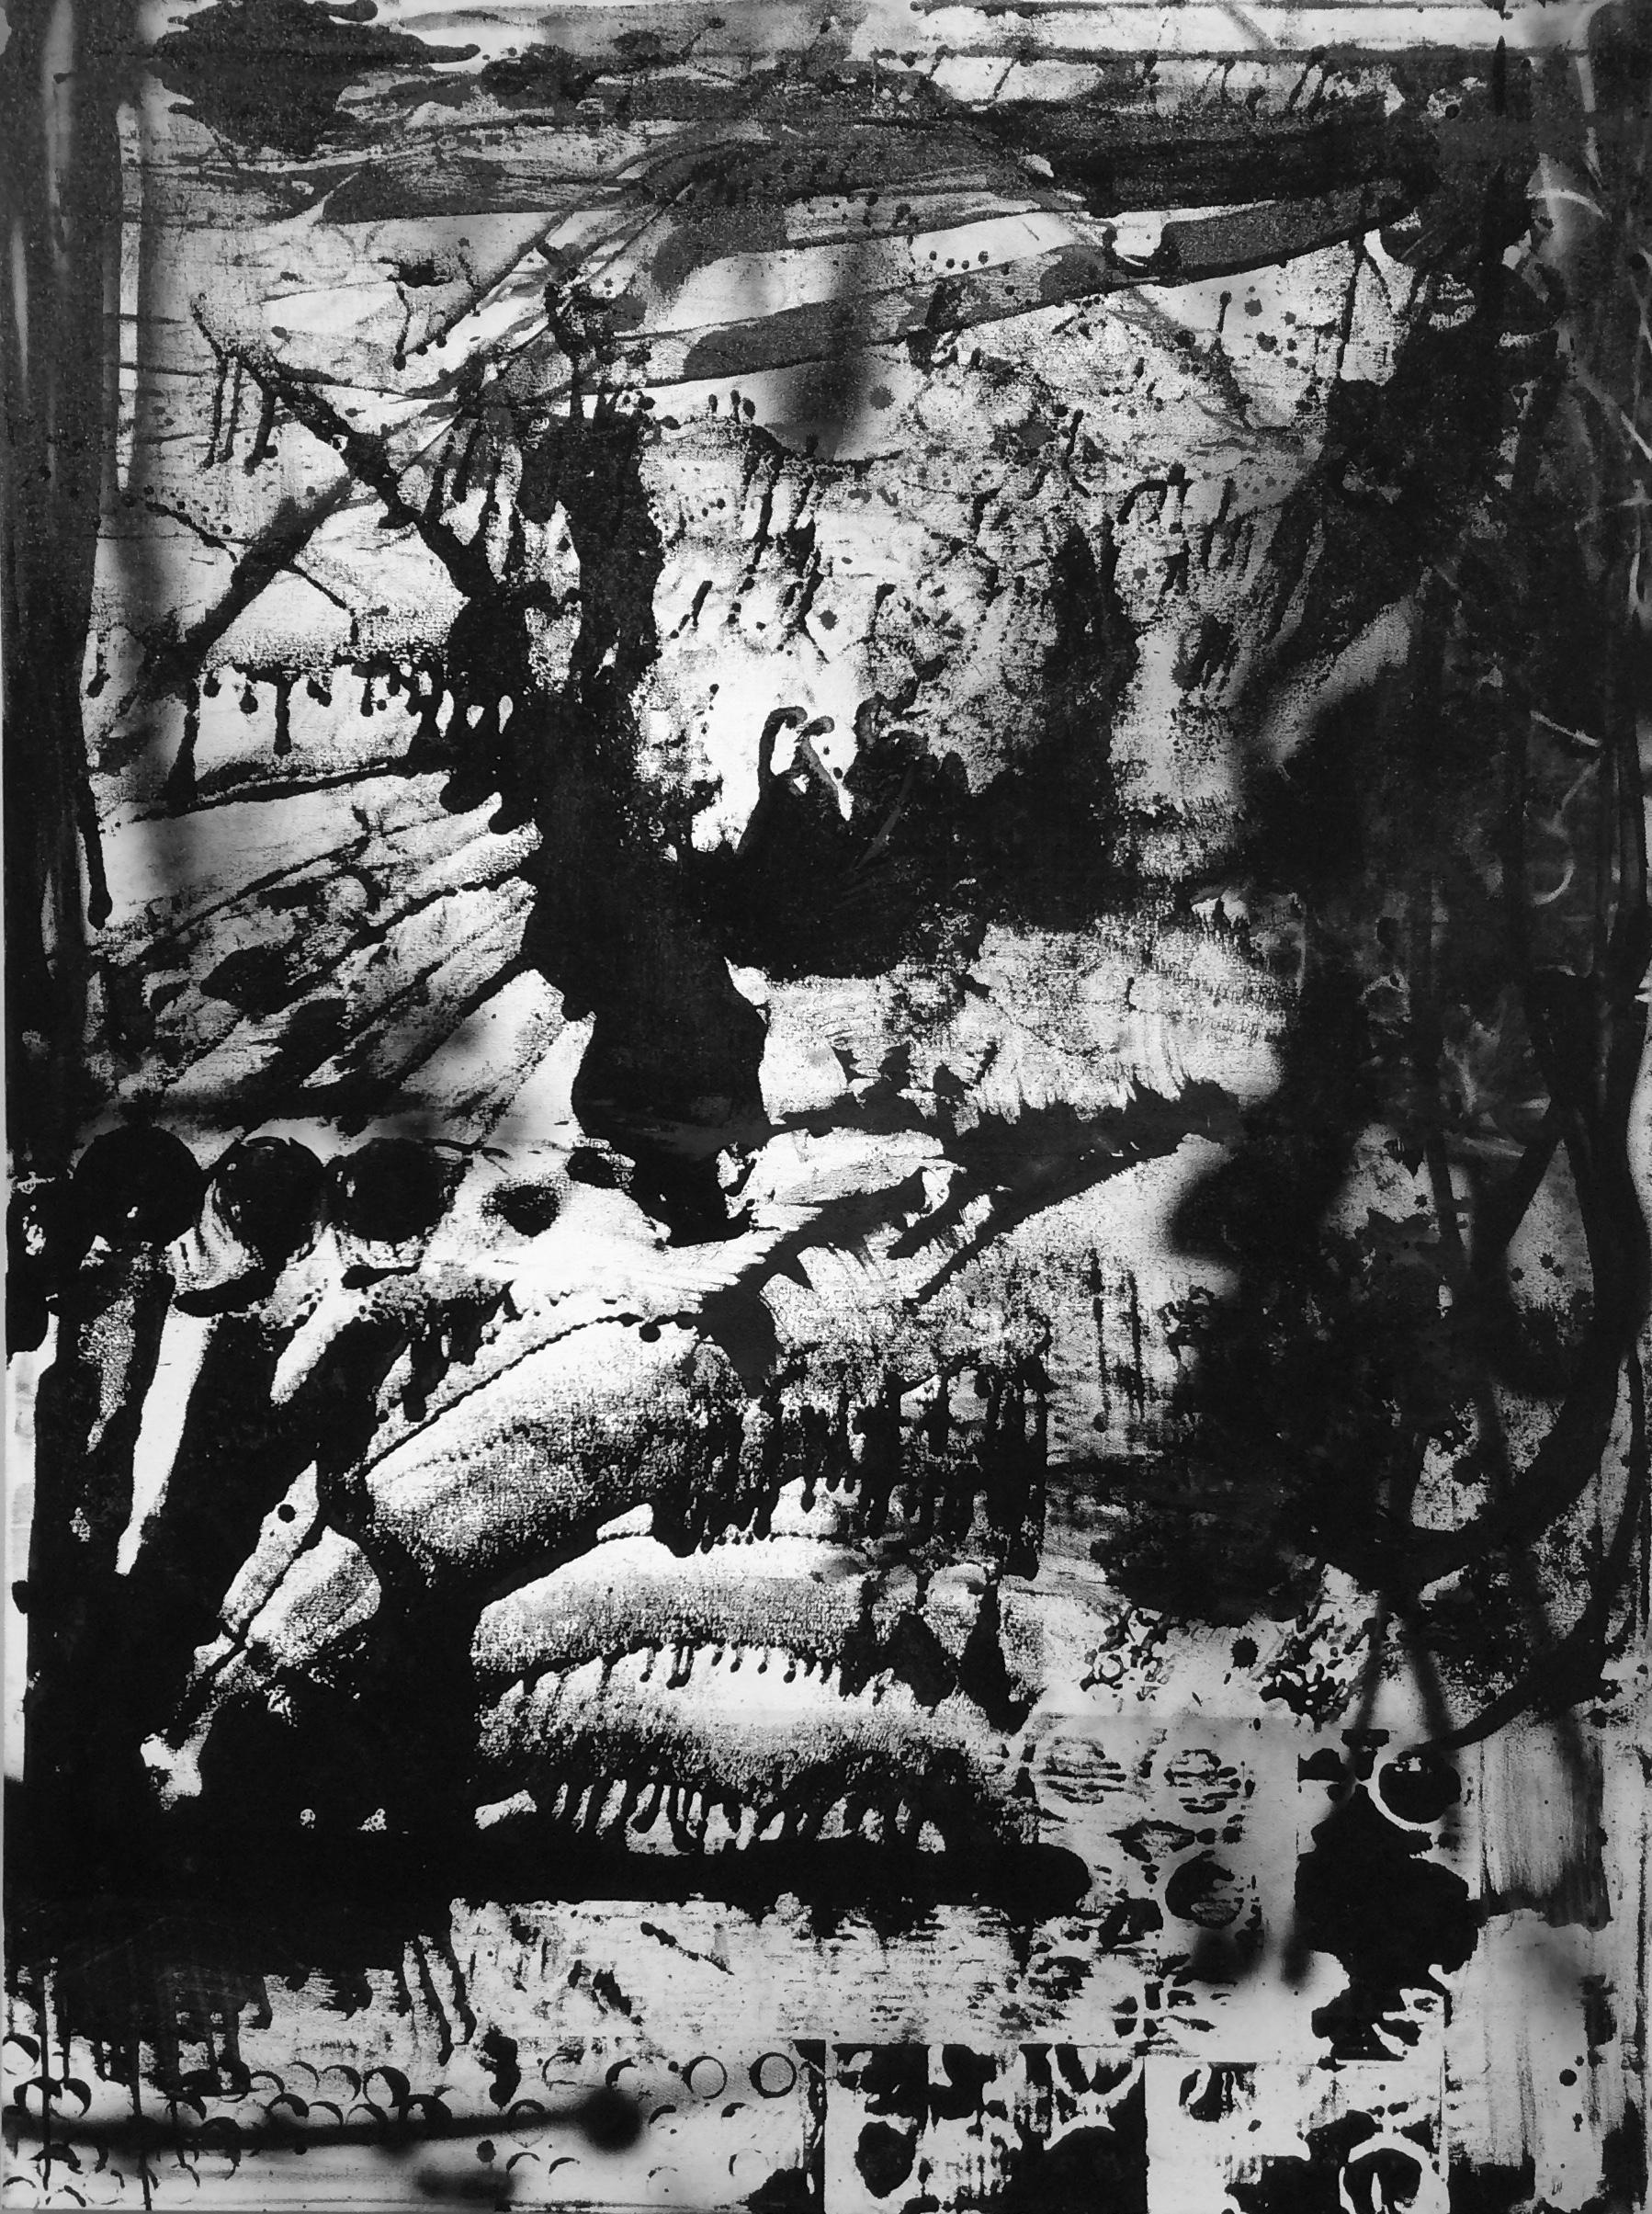 Zachary Garrett / Flag #5 / 2017 / Acrylic on canvas / 48 x 36 inches